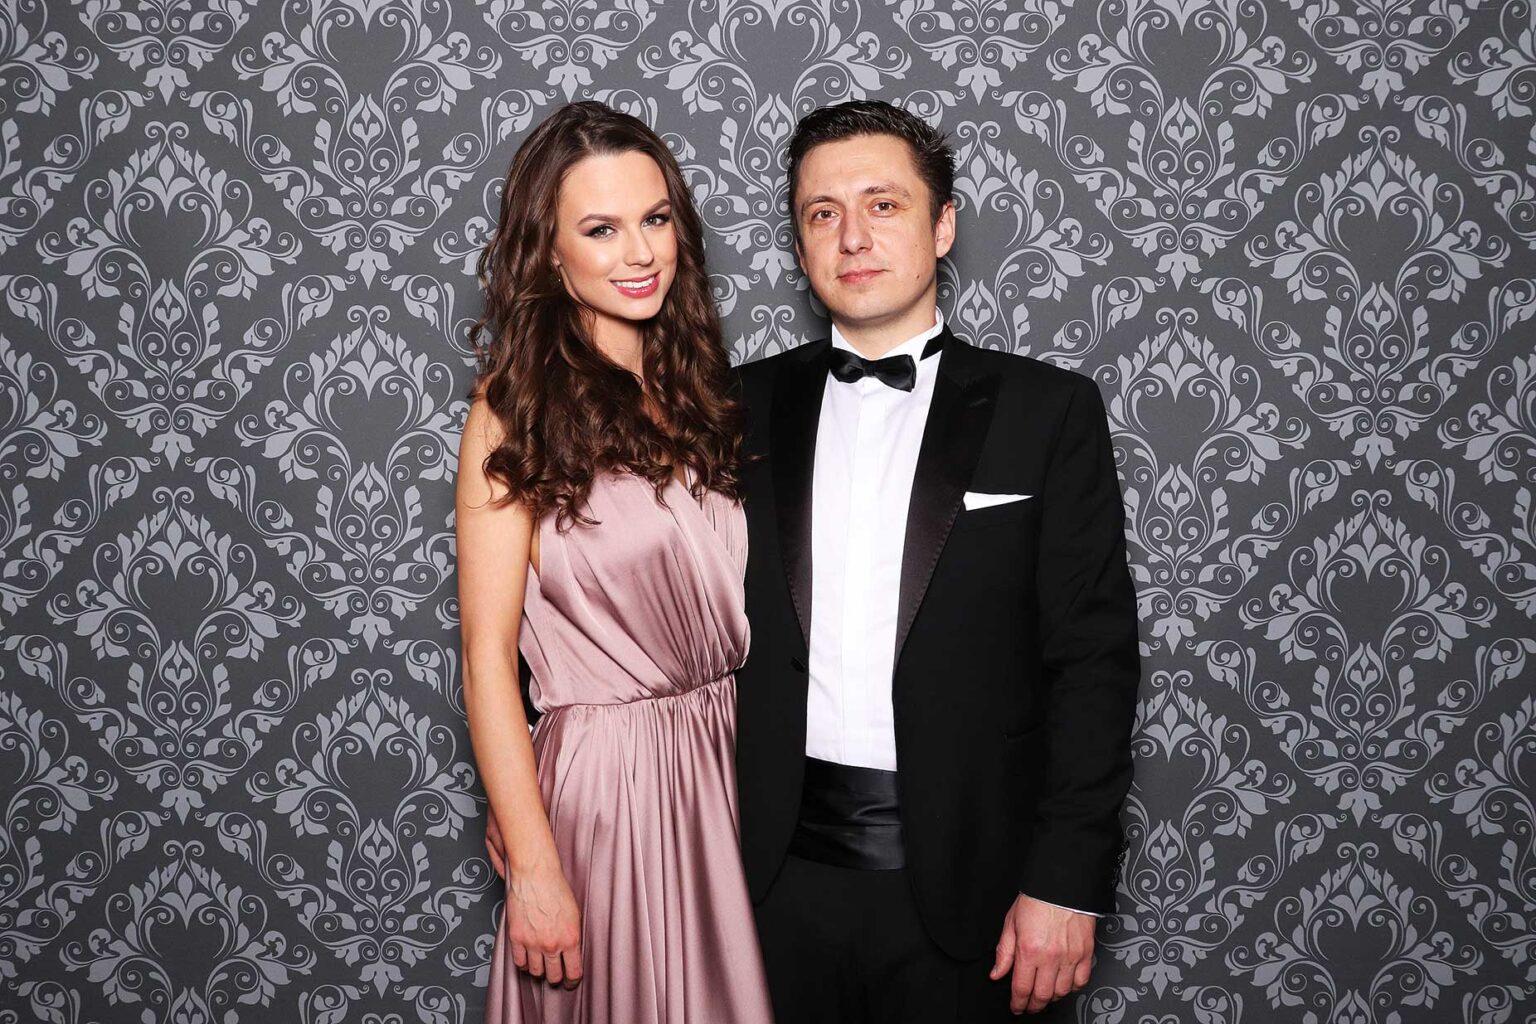 fotostena na prenajom ples svadba oslava vecierok FOTOKÚTIK.sk